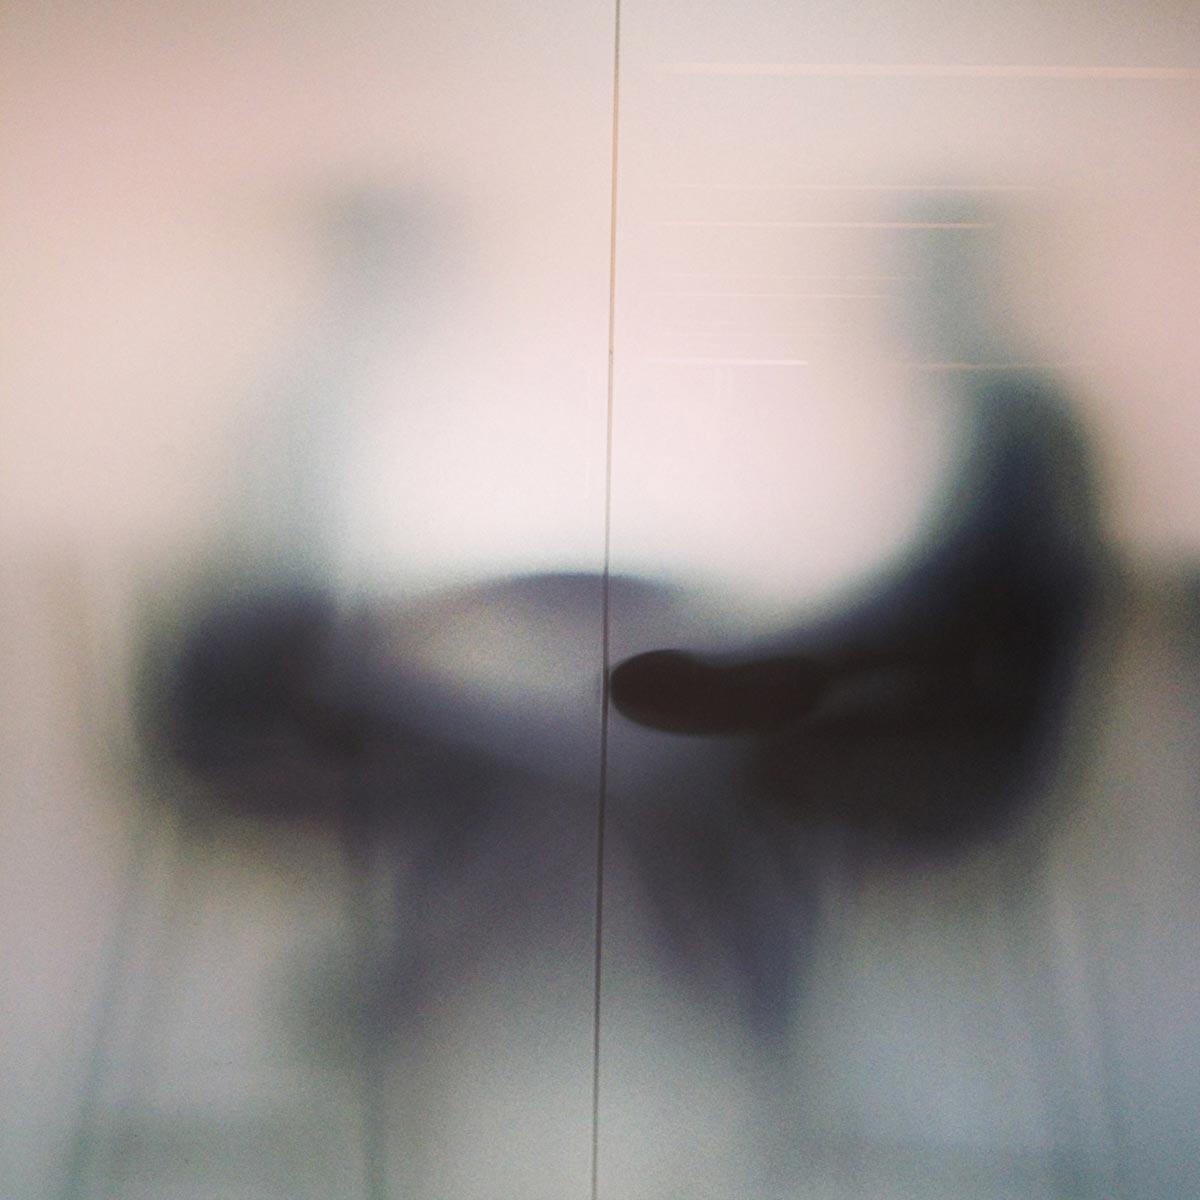 Shadow figures, Tate Modern